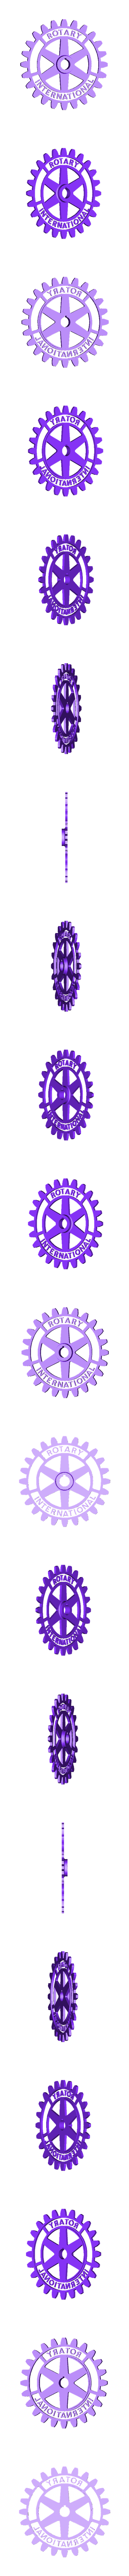 Rotary_Wheel_Gold.stl Download free STL file Rotary International Symbol - Dual Extrusion • 3D printer template, abbymath